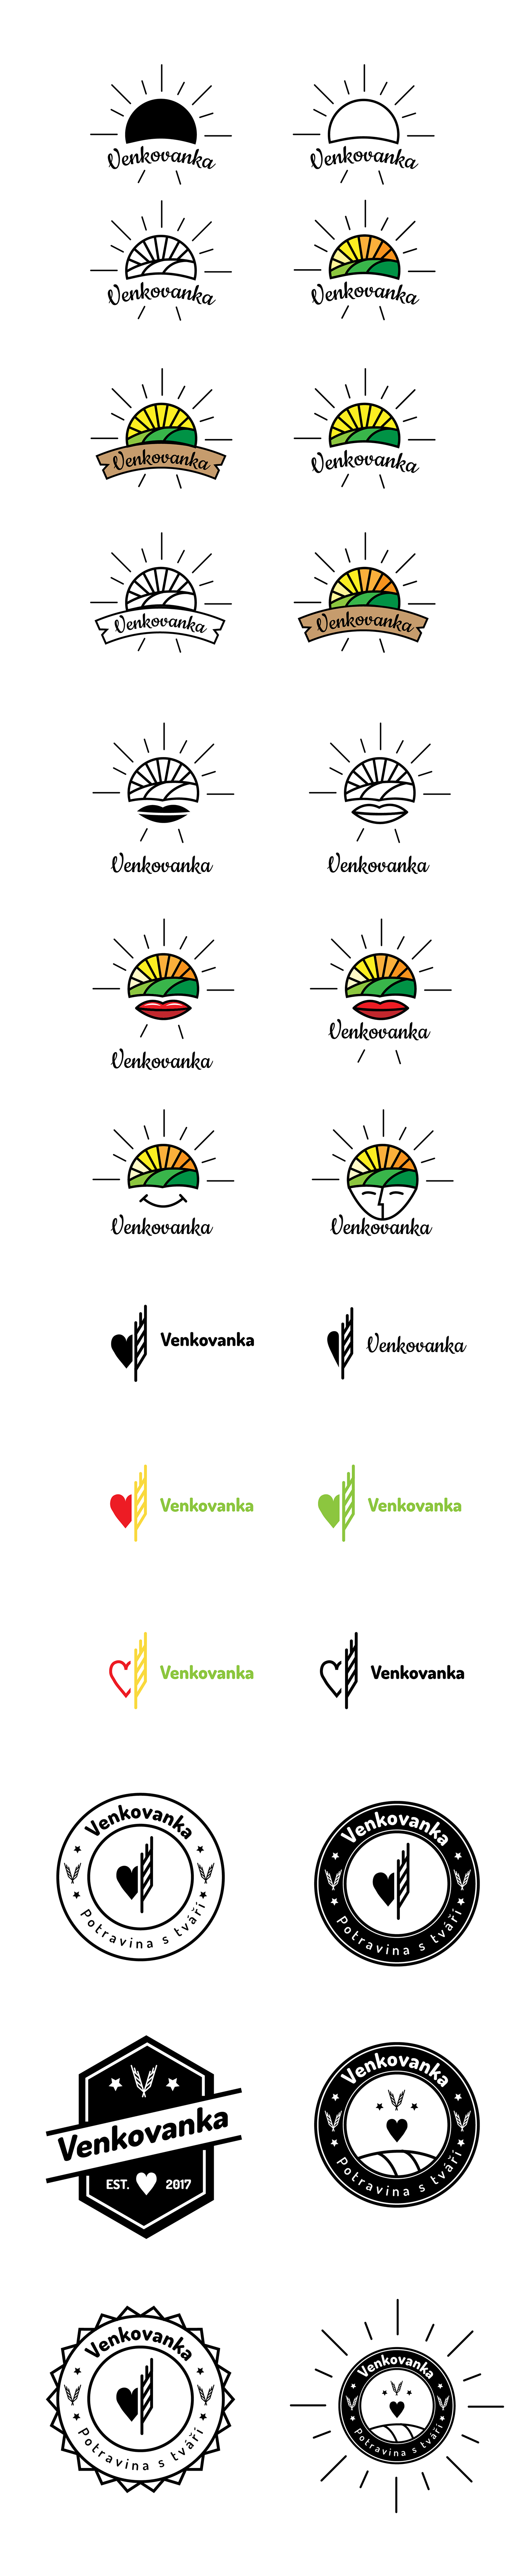 logo Venkovanka farm goods